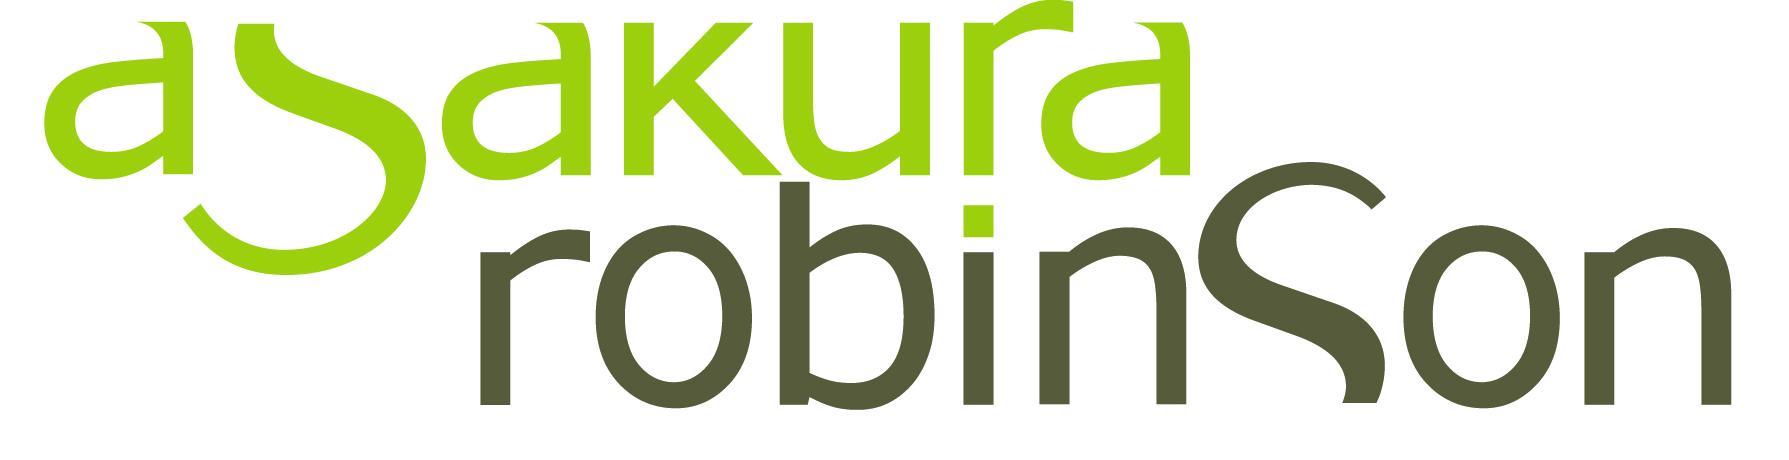 asakura_robinson_logo_simple.jpg